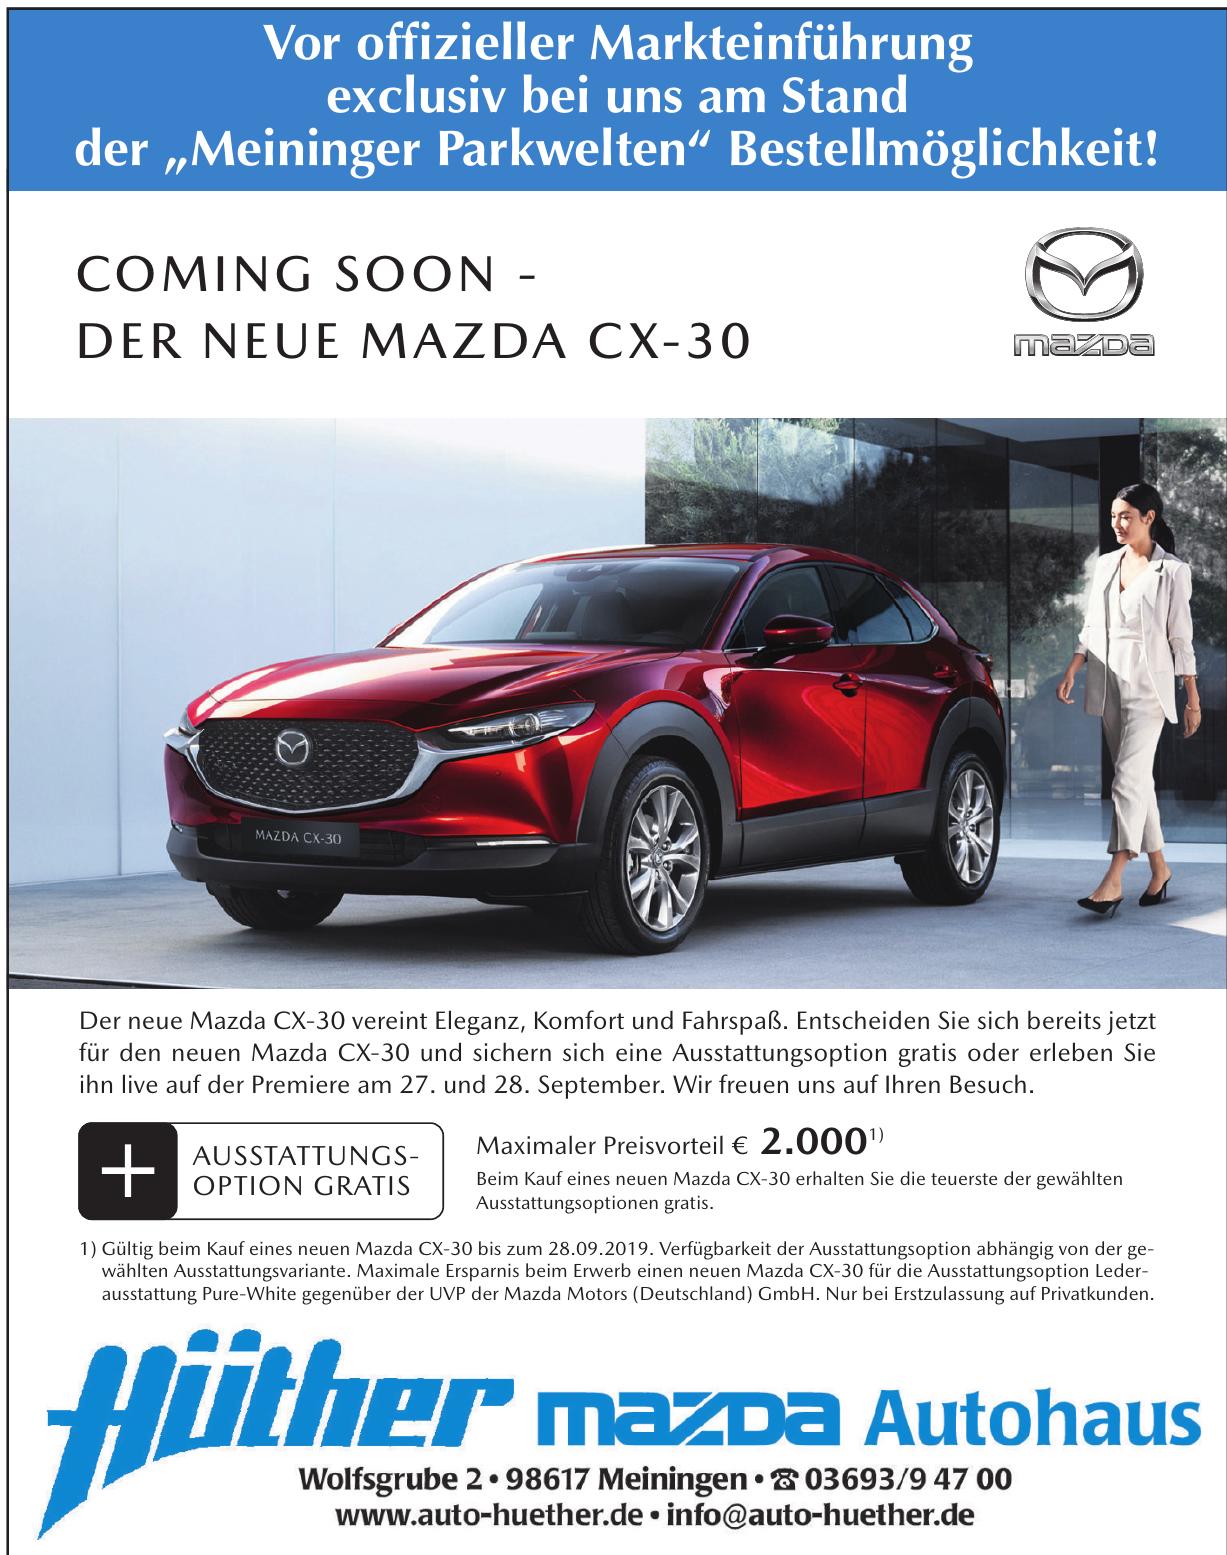 Mazda Autohaus Hüther